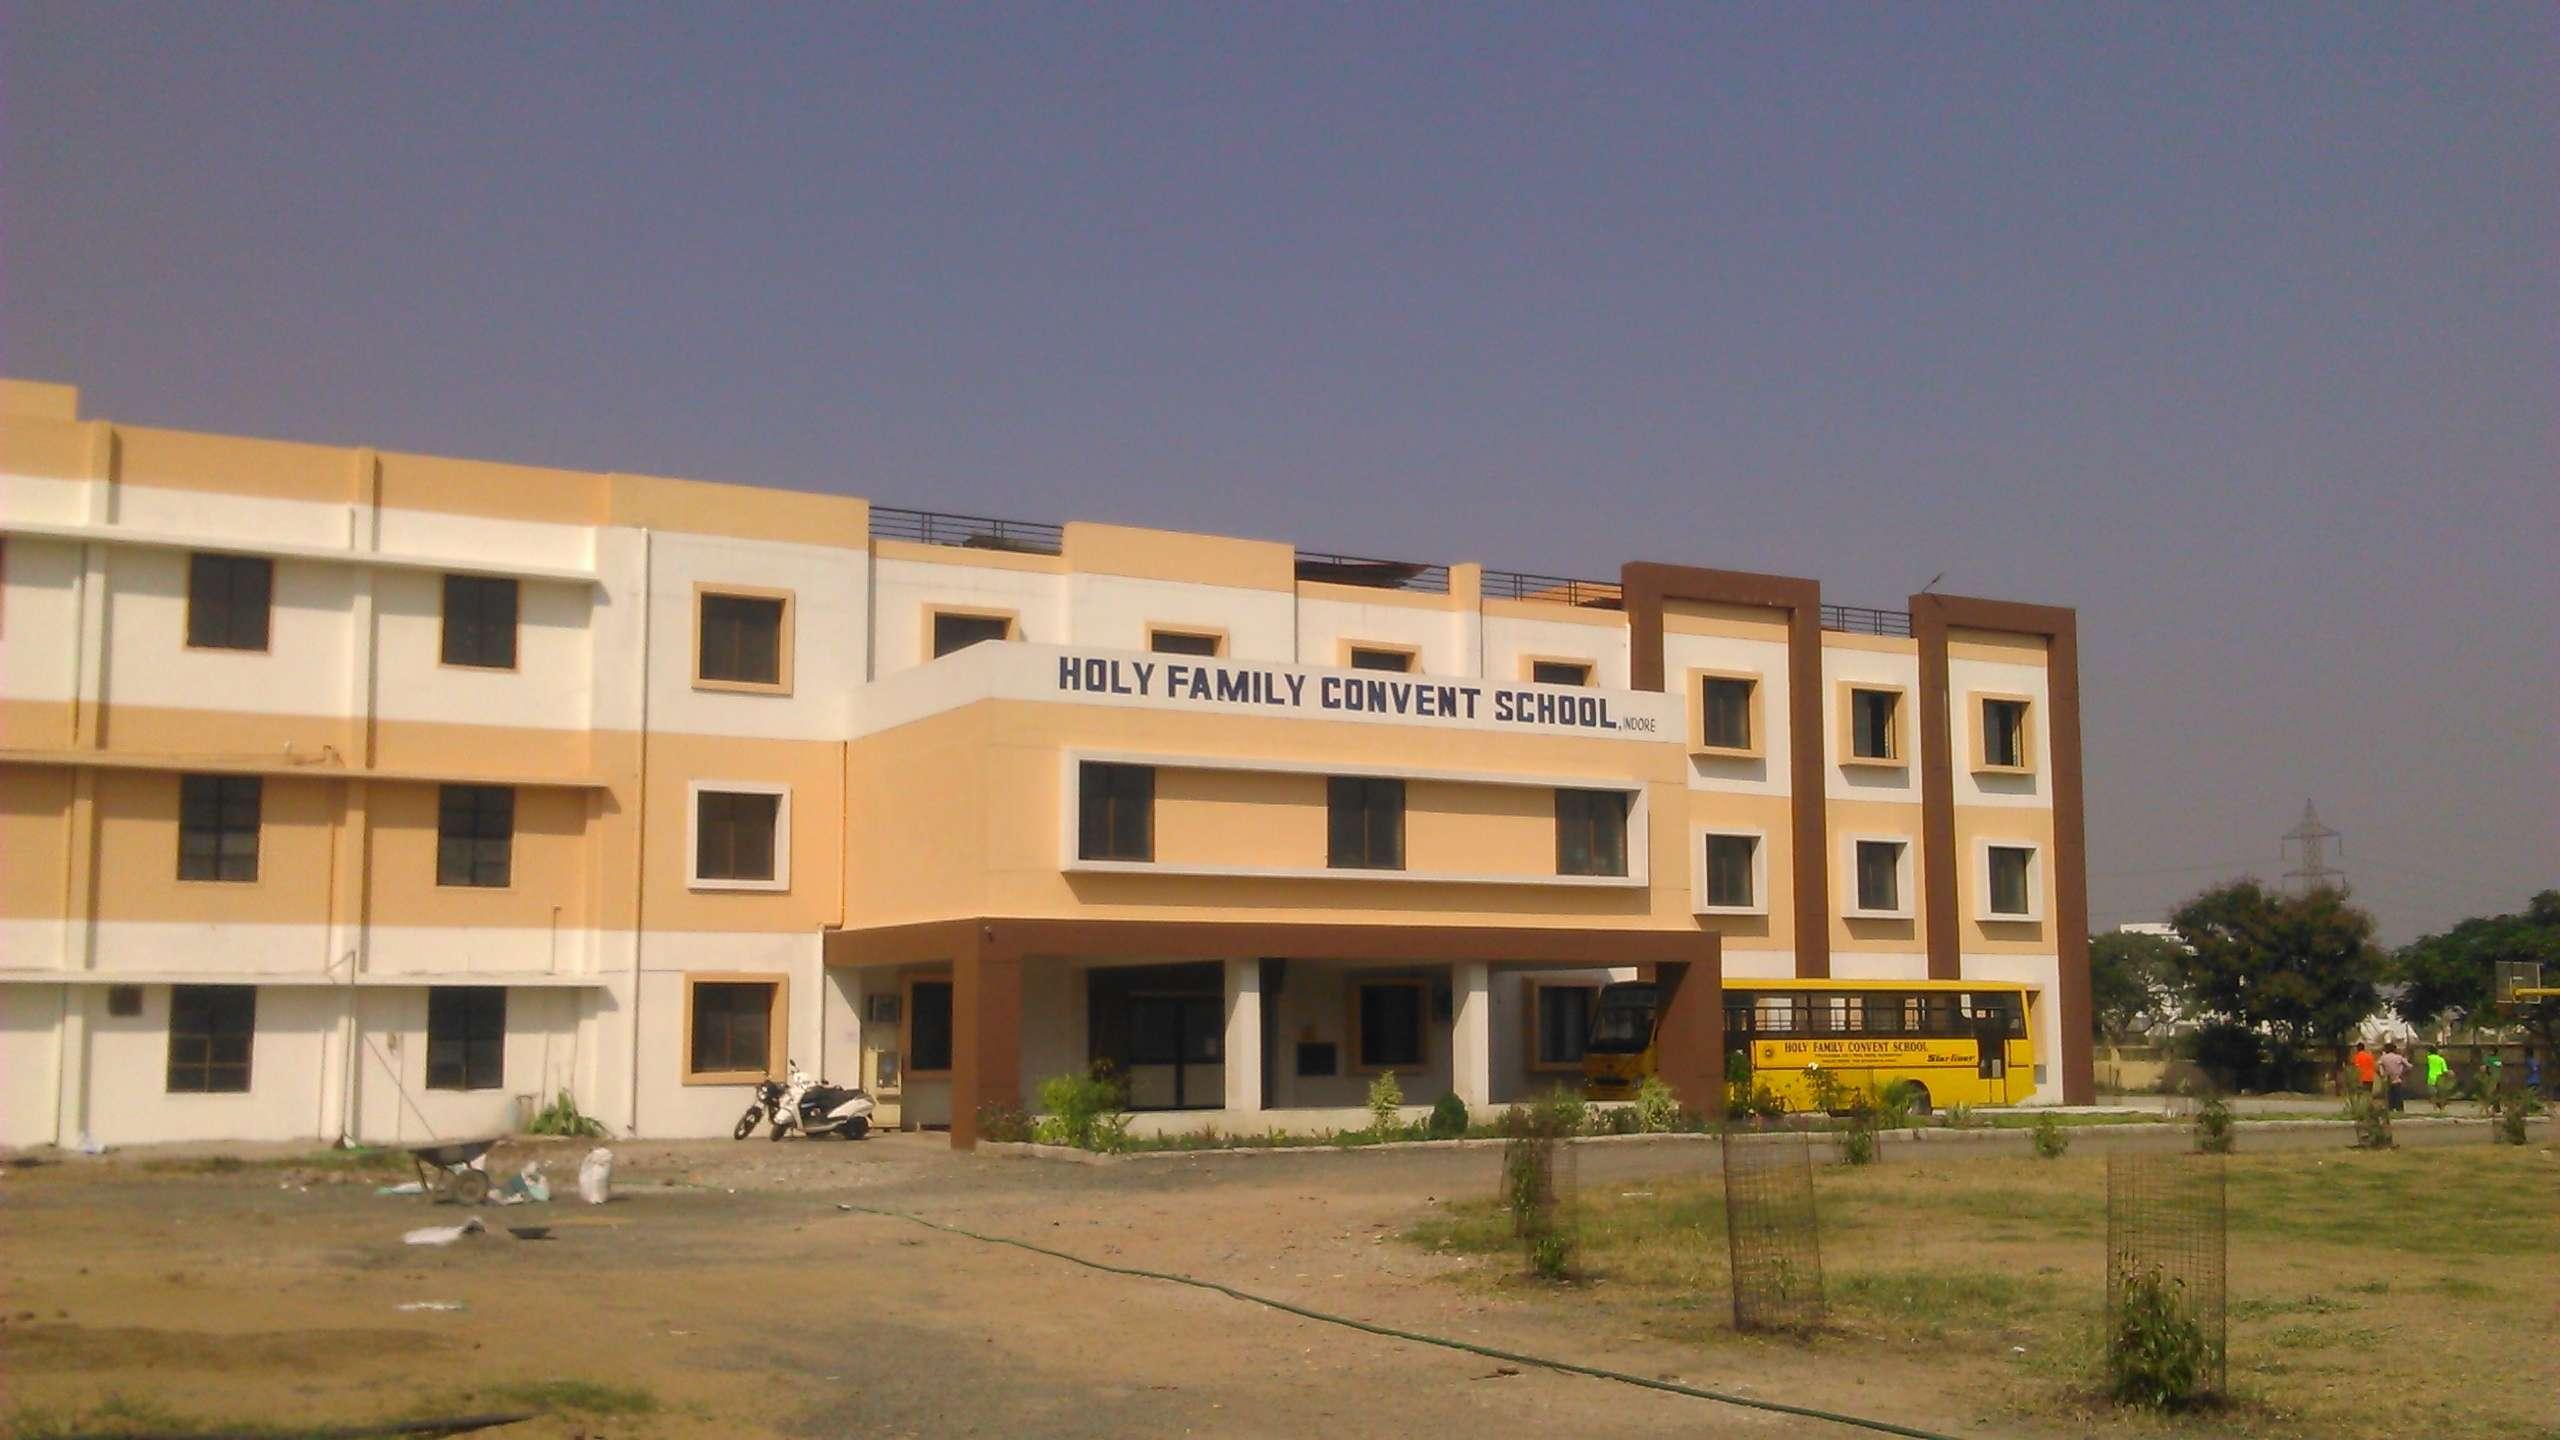 Holy Family Convent School Holy Family Convent School Pipliyakumar Mayakheri Road P O Vijaynagar Indore 452 010 1030626